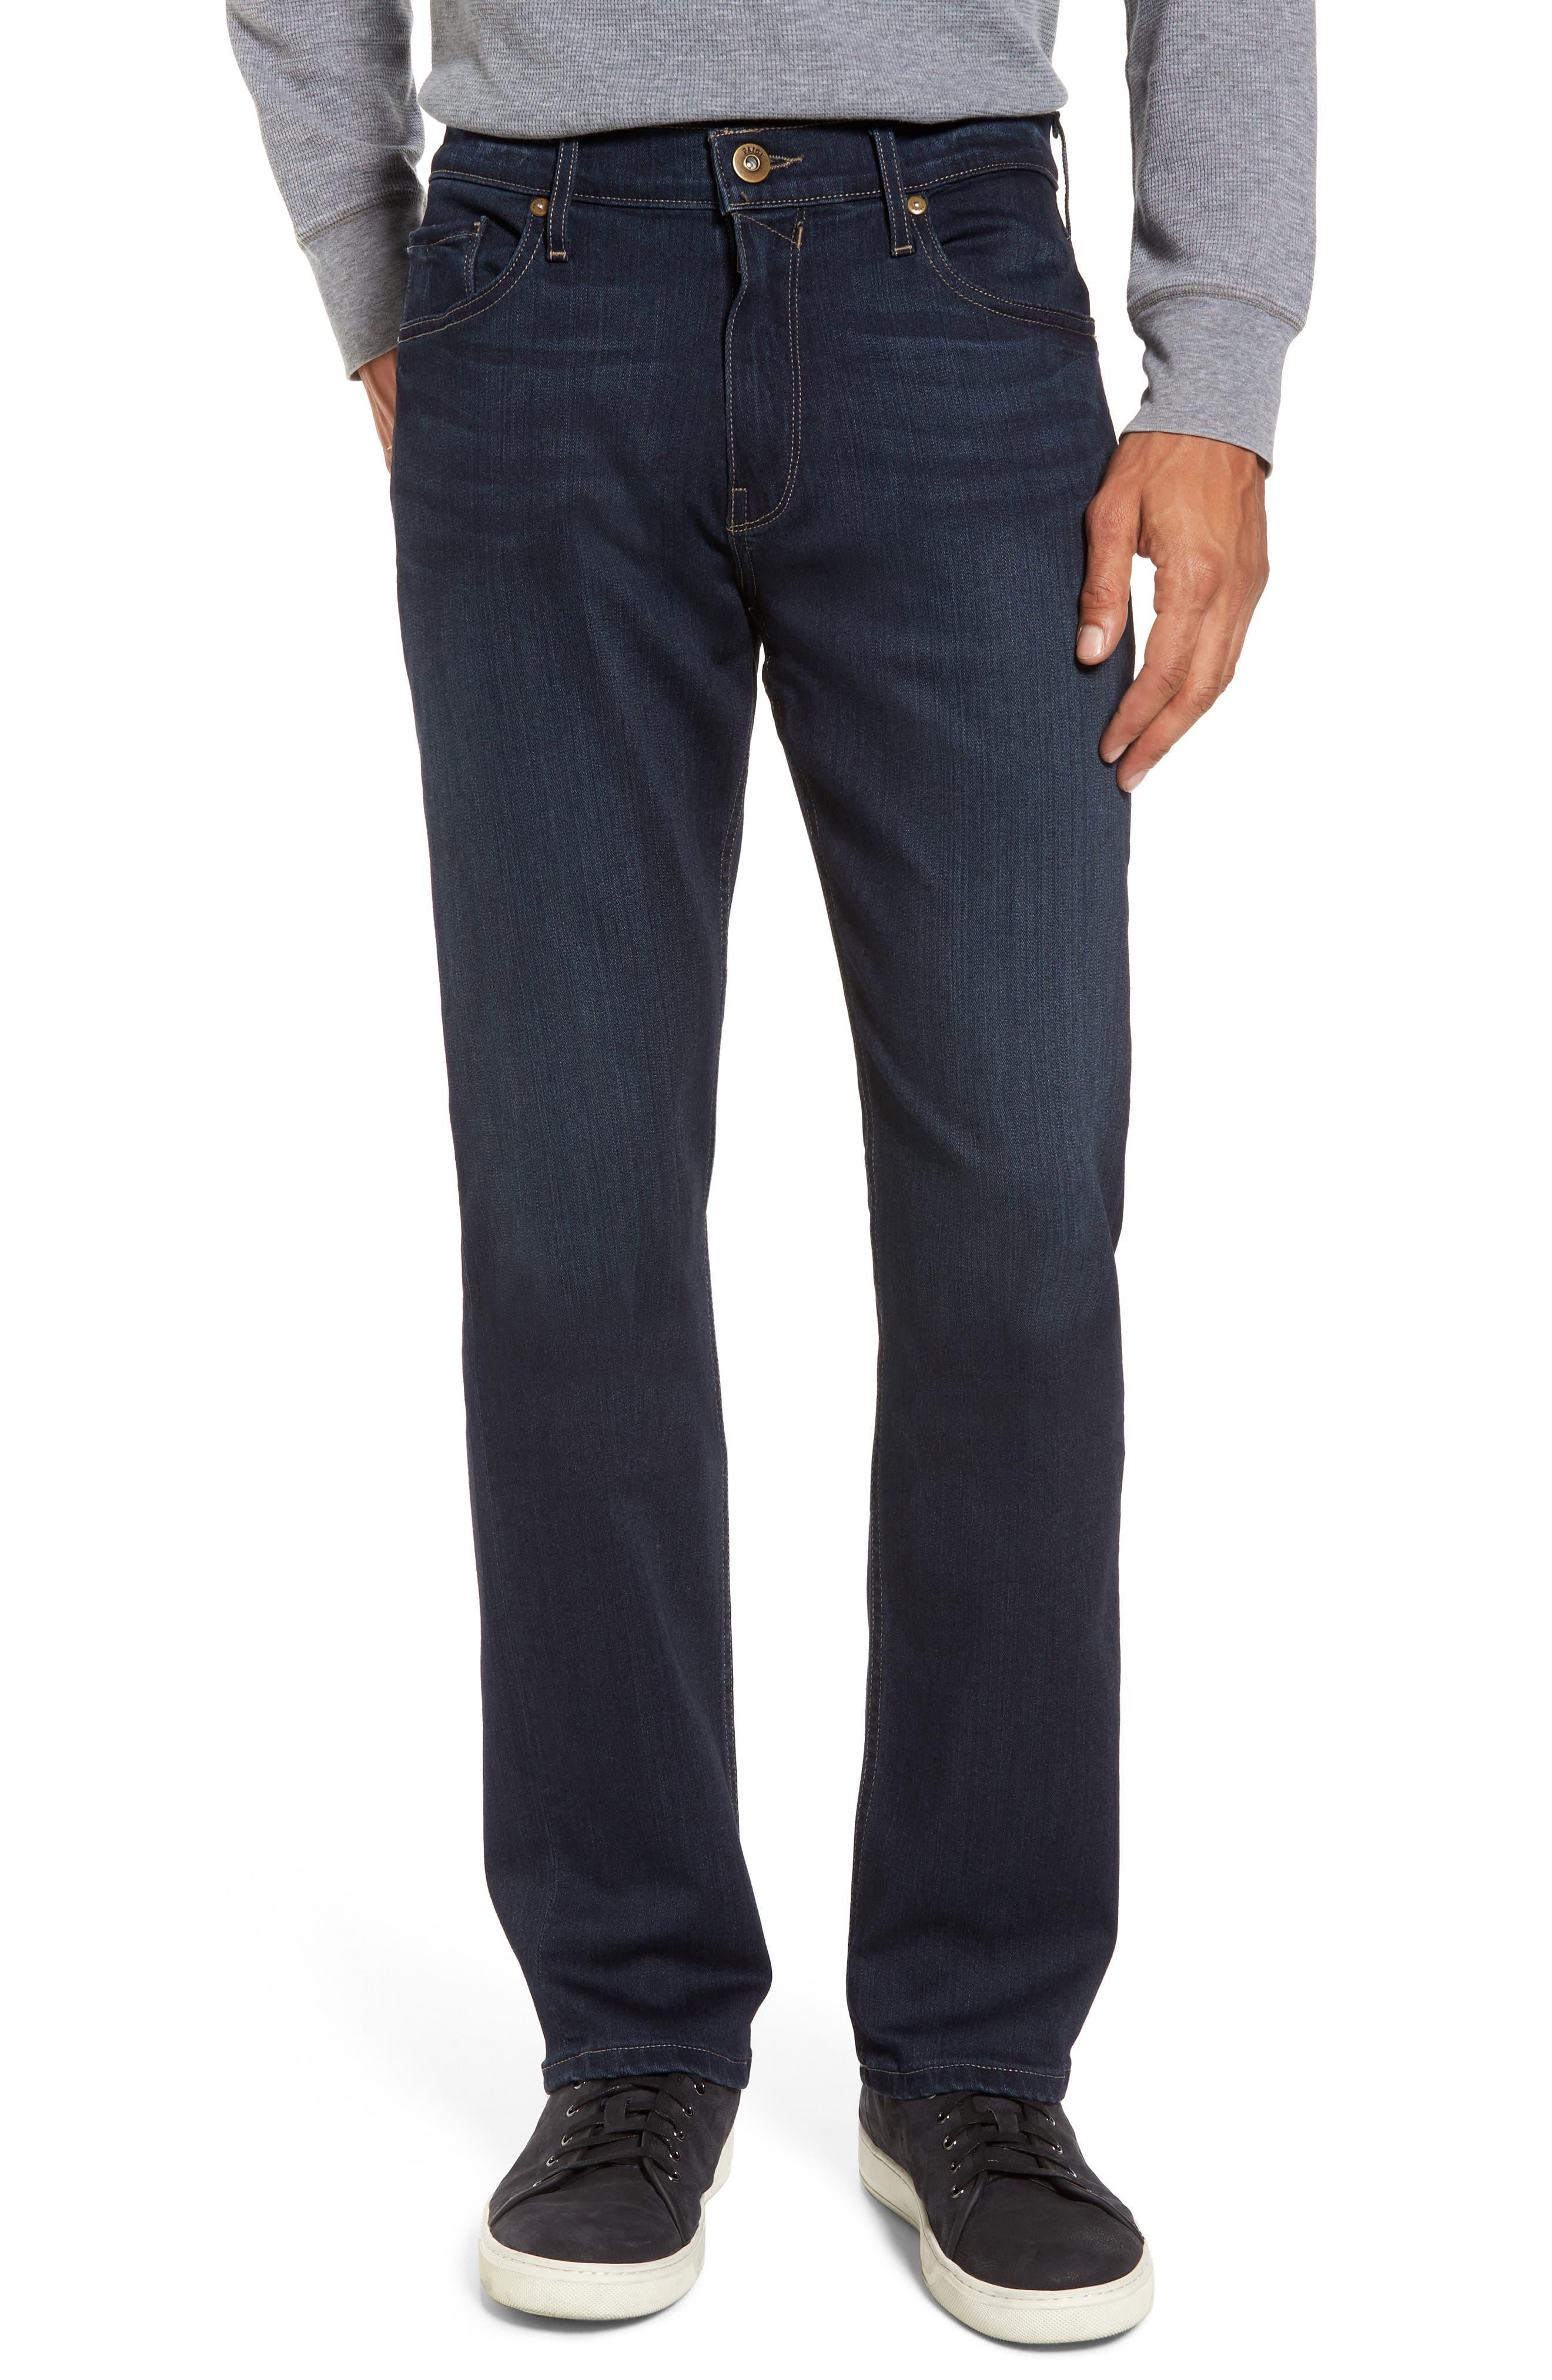 Transcend - Normandie Straight Fit Jeans,                         Main,                         color,